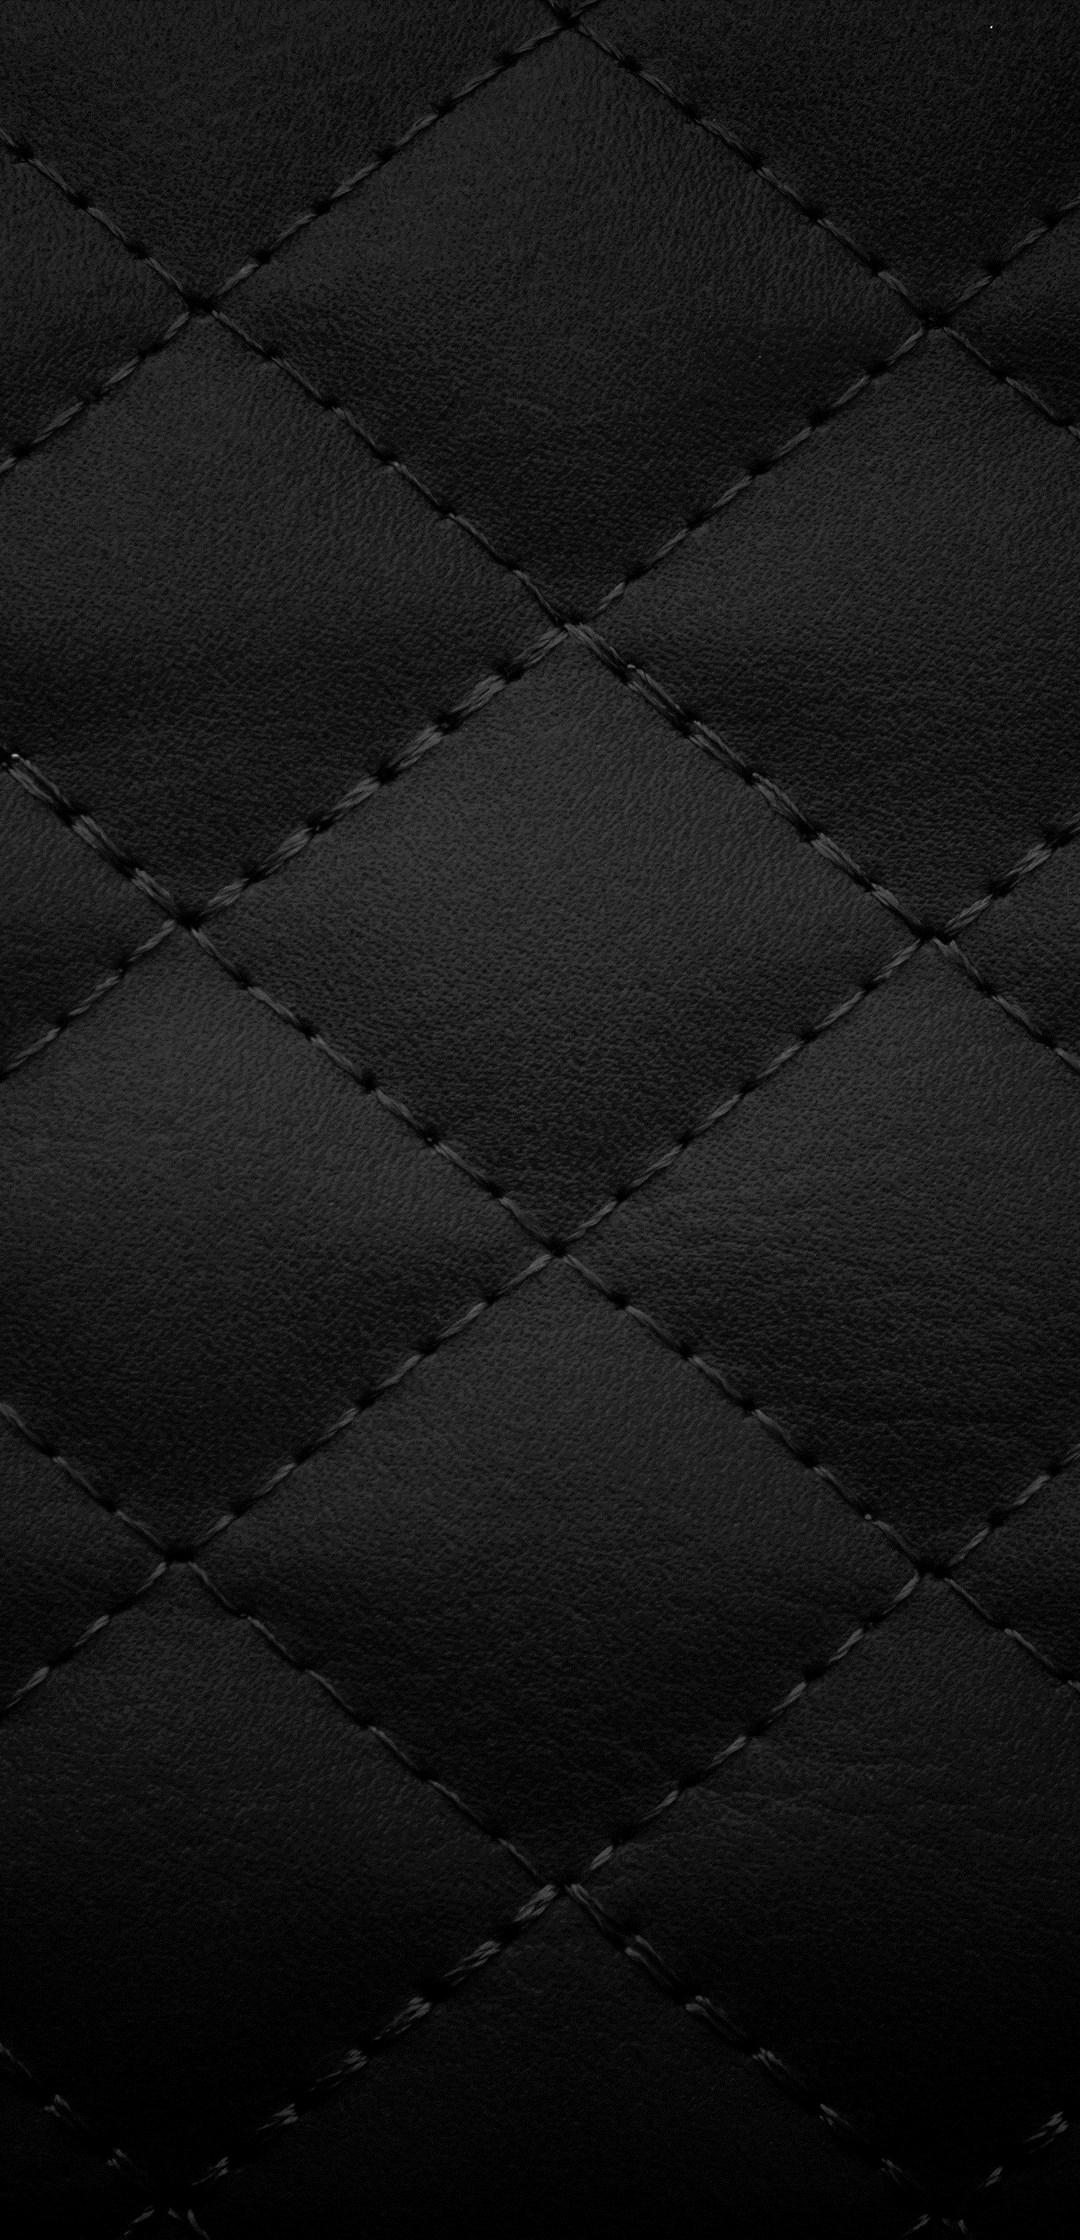 1080x2240 Background HD Wallpaper